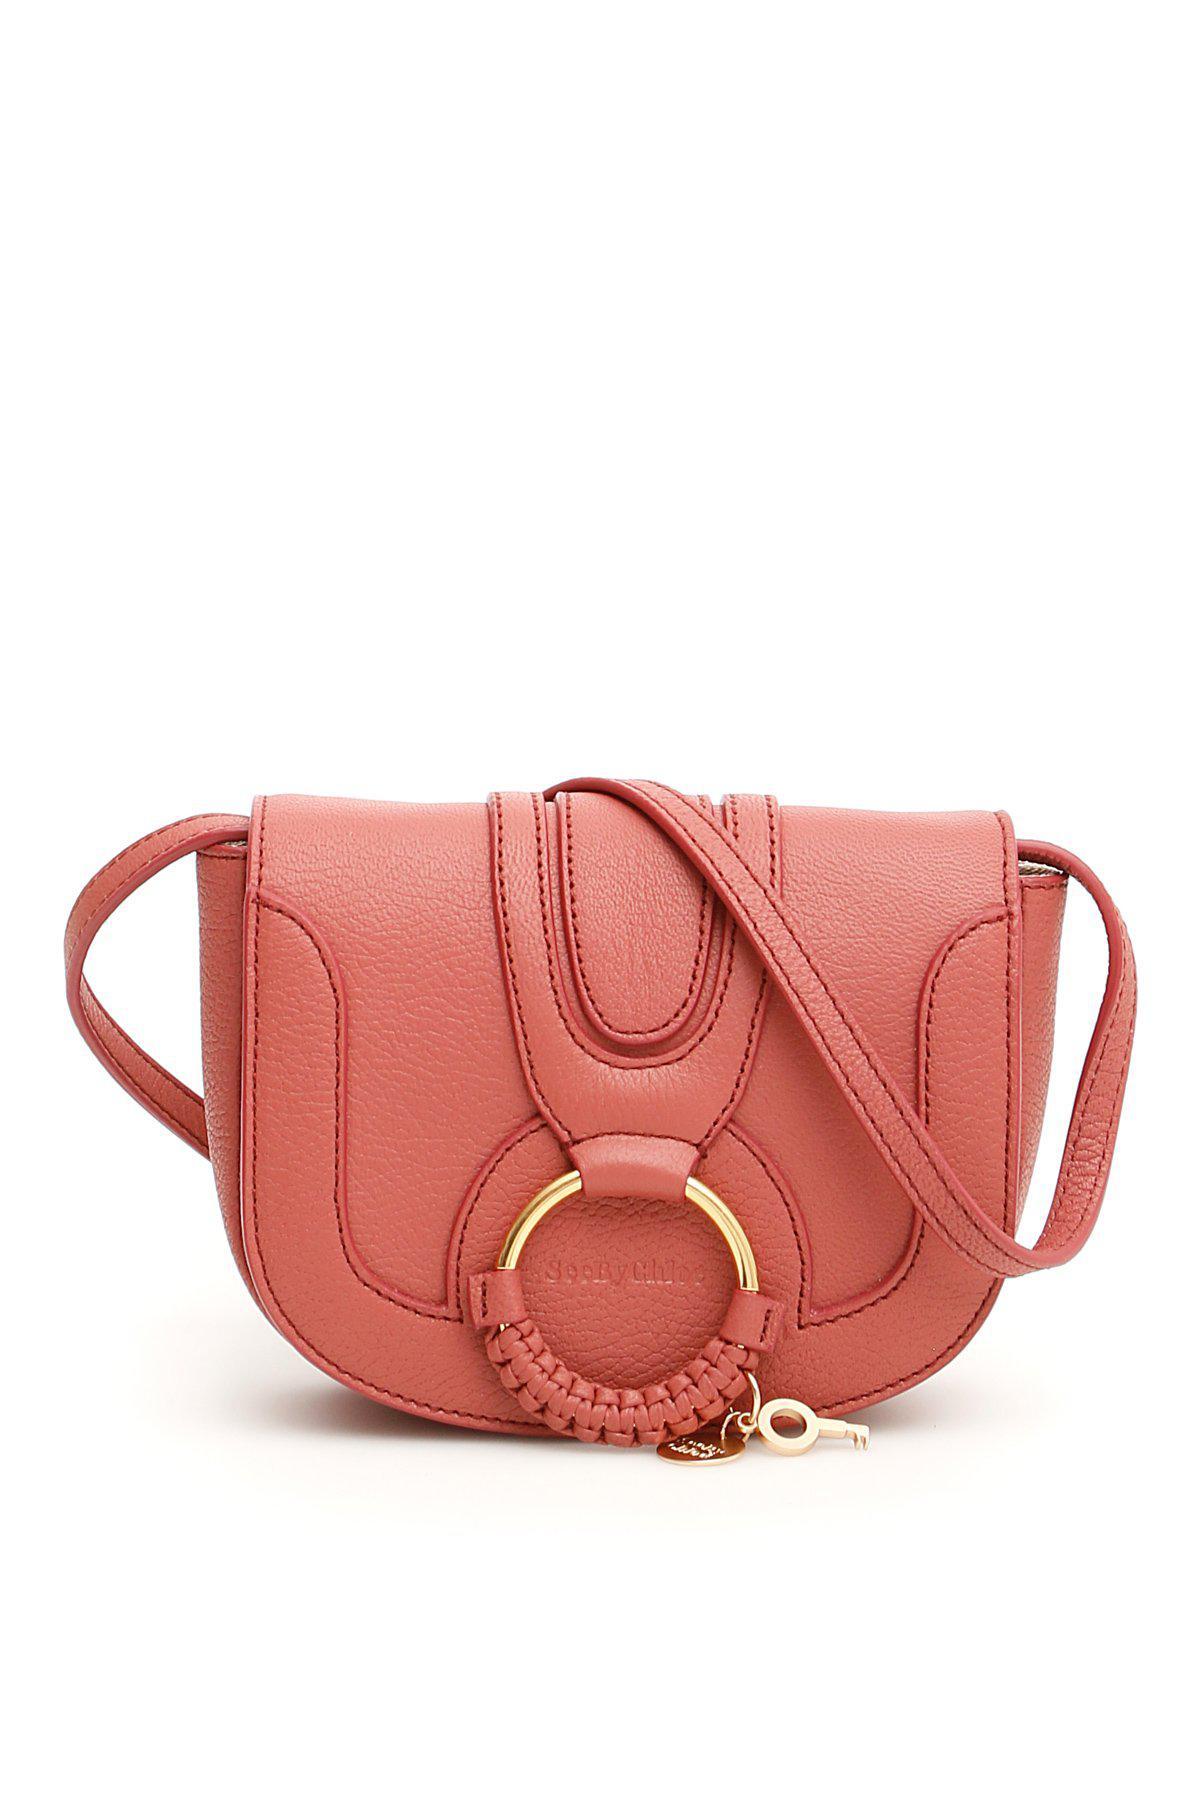 d4f0a6841a91 See By Chloé - Pink Hana Mini Leather Shoulder Bag - Lyst. View fullscreen